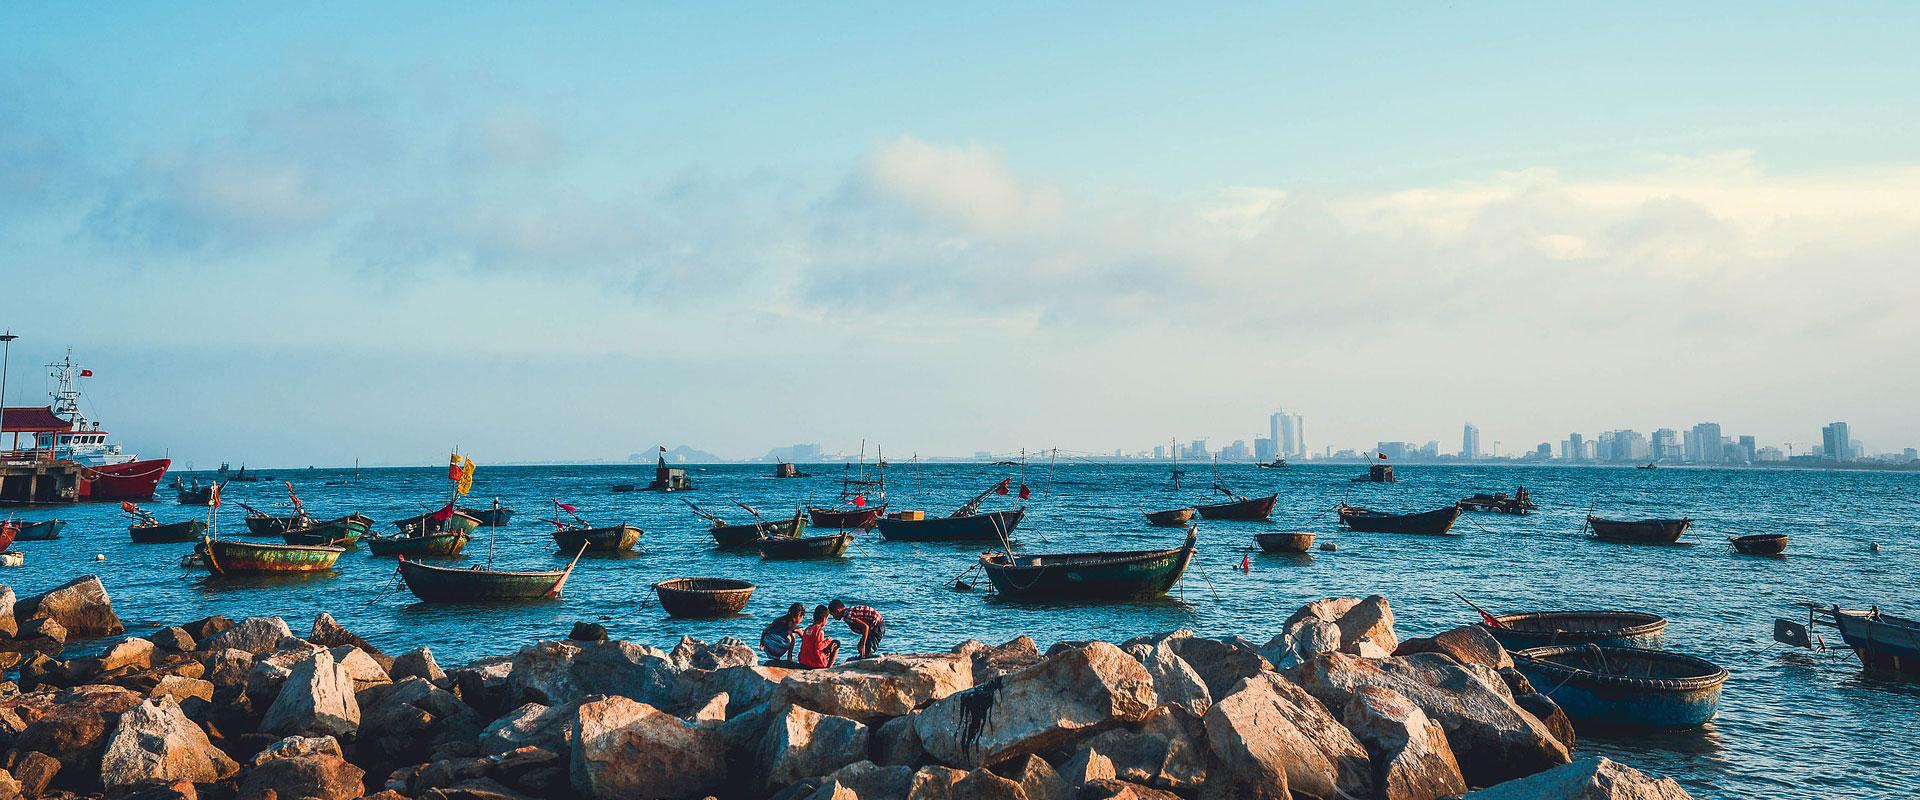 plage rochers bateaux